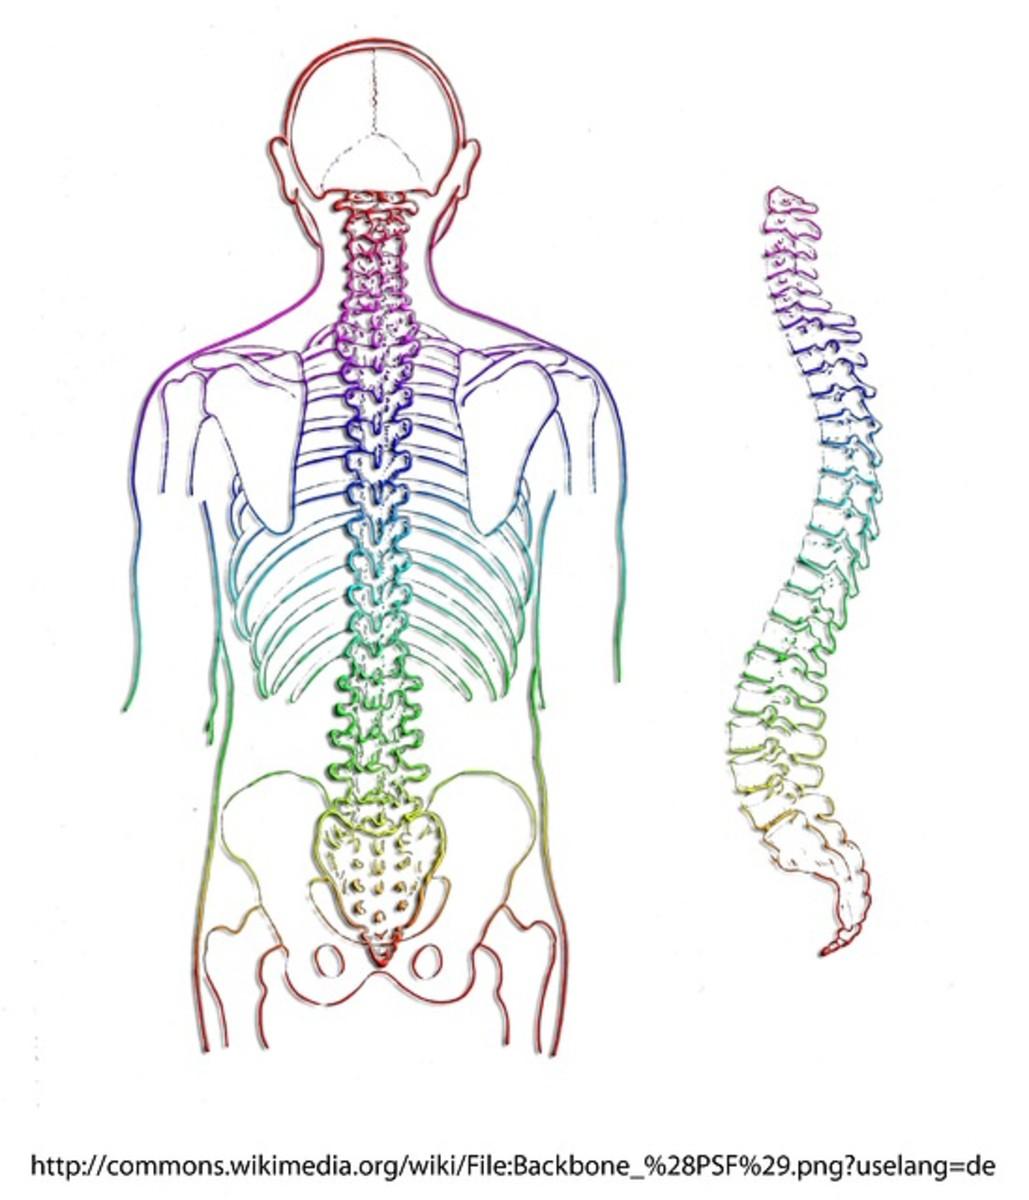 Can You Dislocate a Rib? : Treatment for rib dislocation